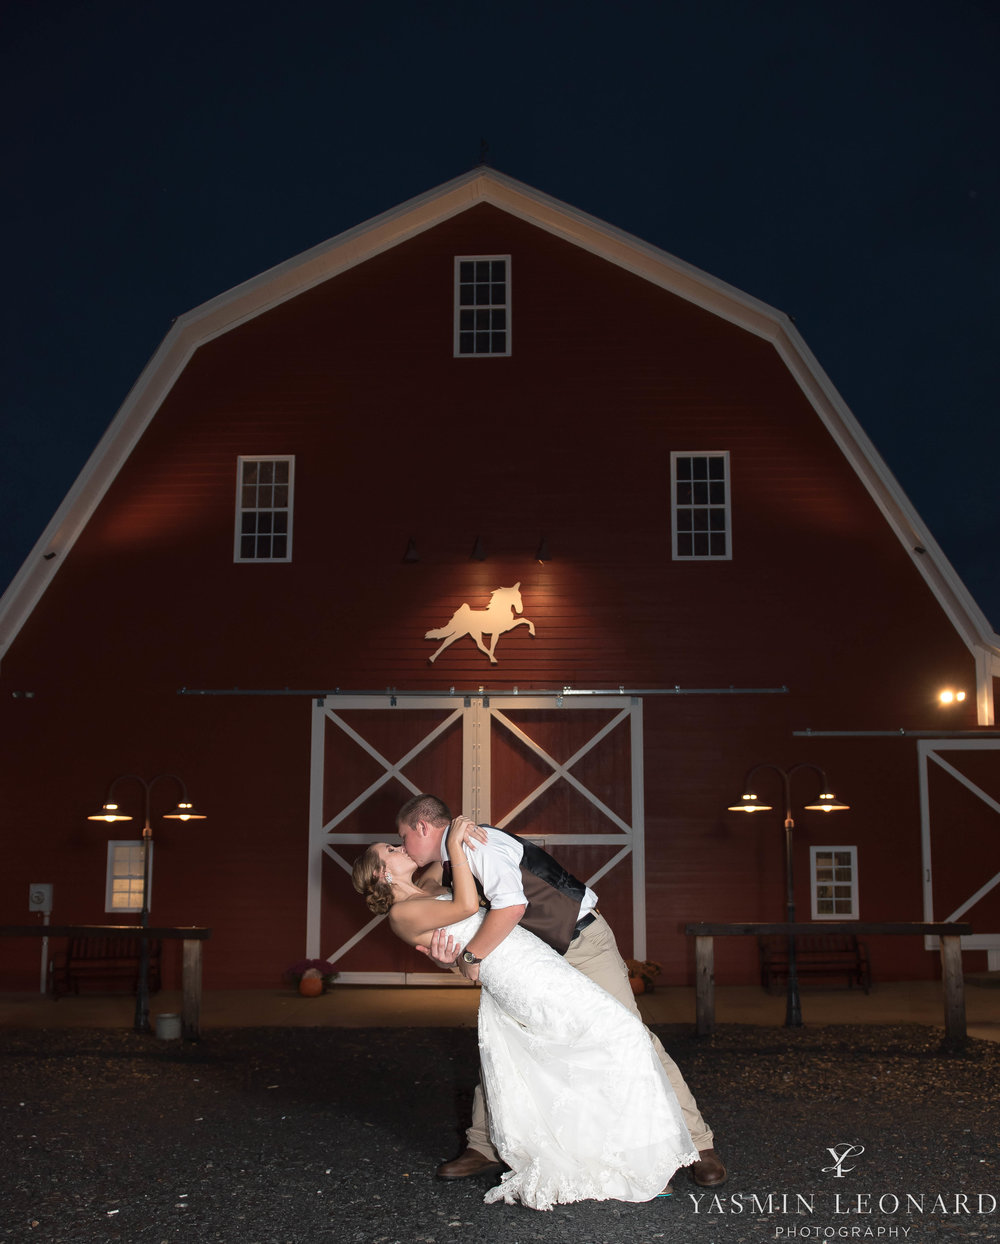 Millikan Farms - NC Wedding Venue - NC Wedding Photographer - Yasmin Leonard Photography - Rain on your wedding day-78.jpg